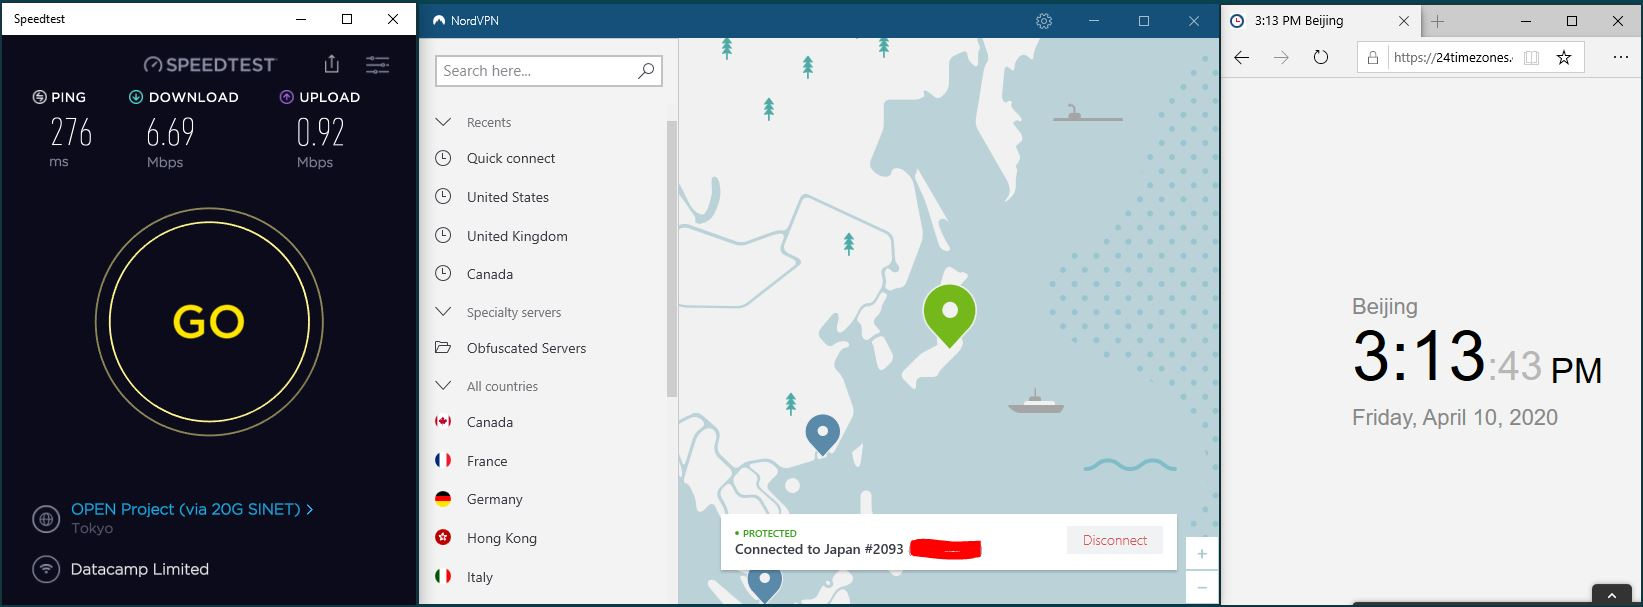 Windows10 NordVPN Japan #2093 中国VPN翻墙 科学上网 SpeedTest测速-20200410